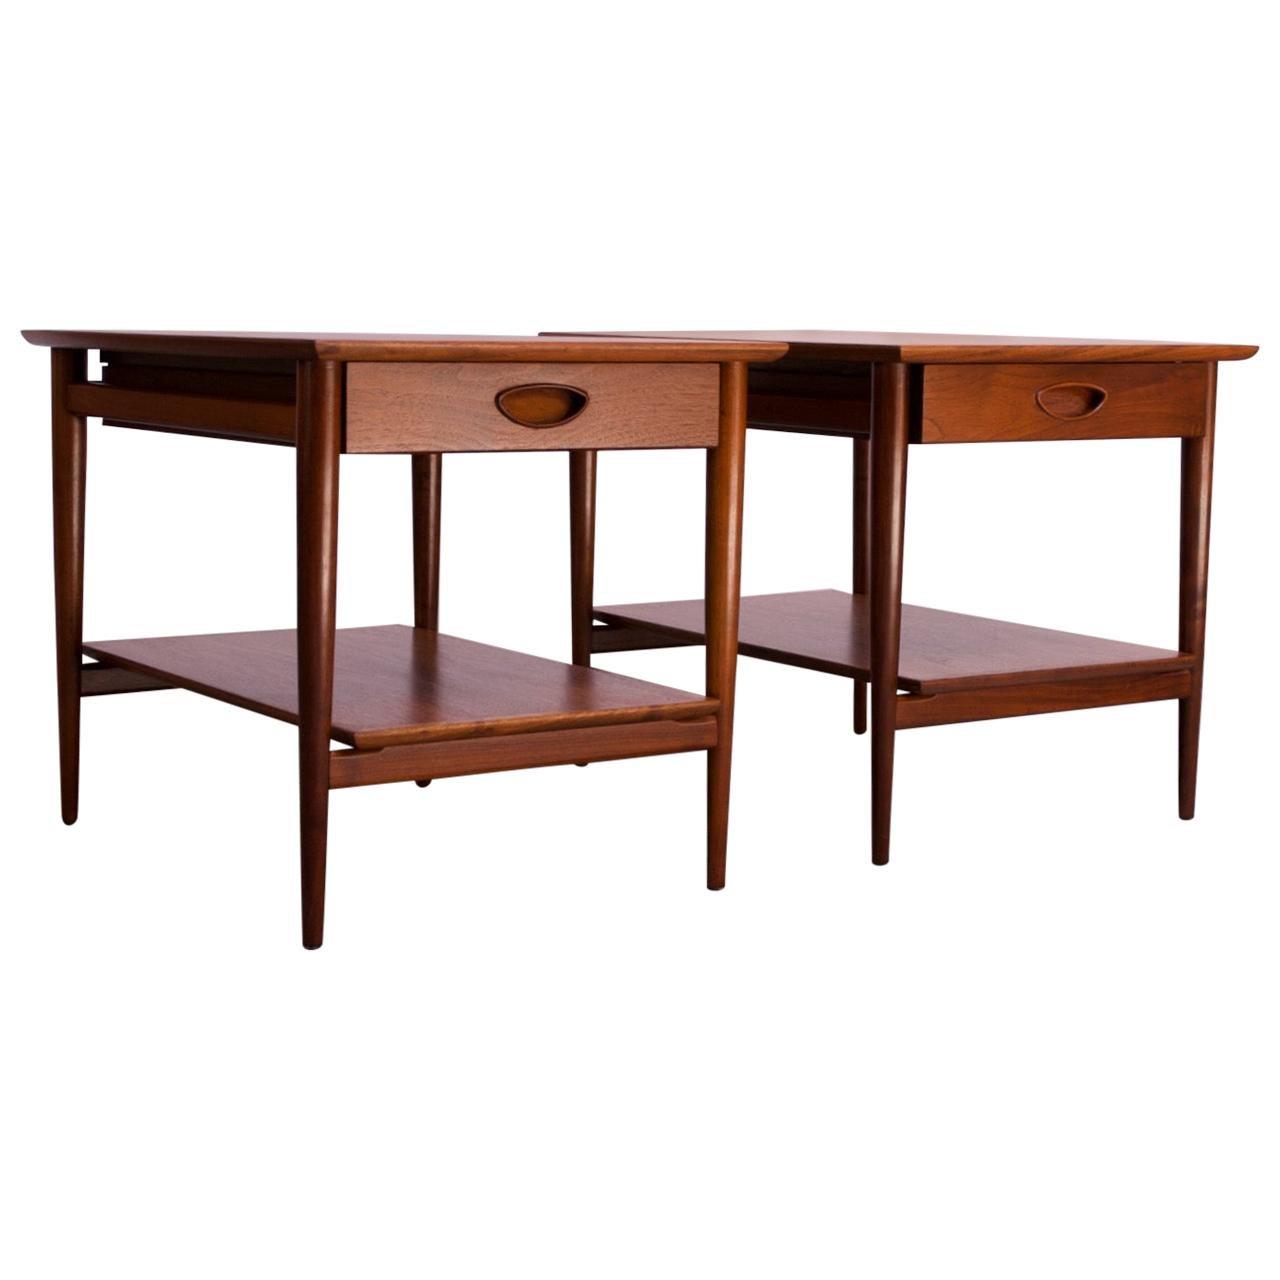 Pair of Heritage Henredon Single Drawer Walnut Side Tables